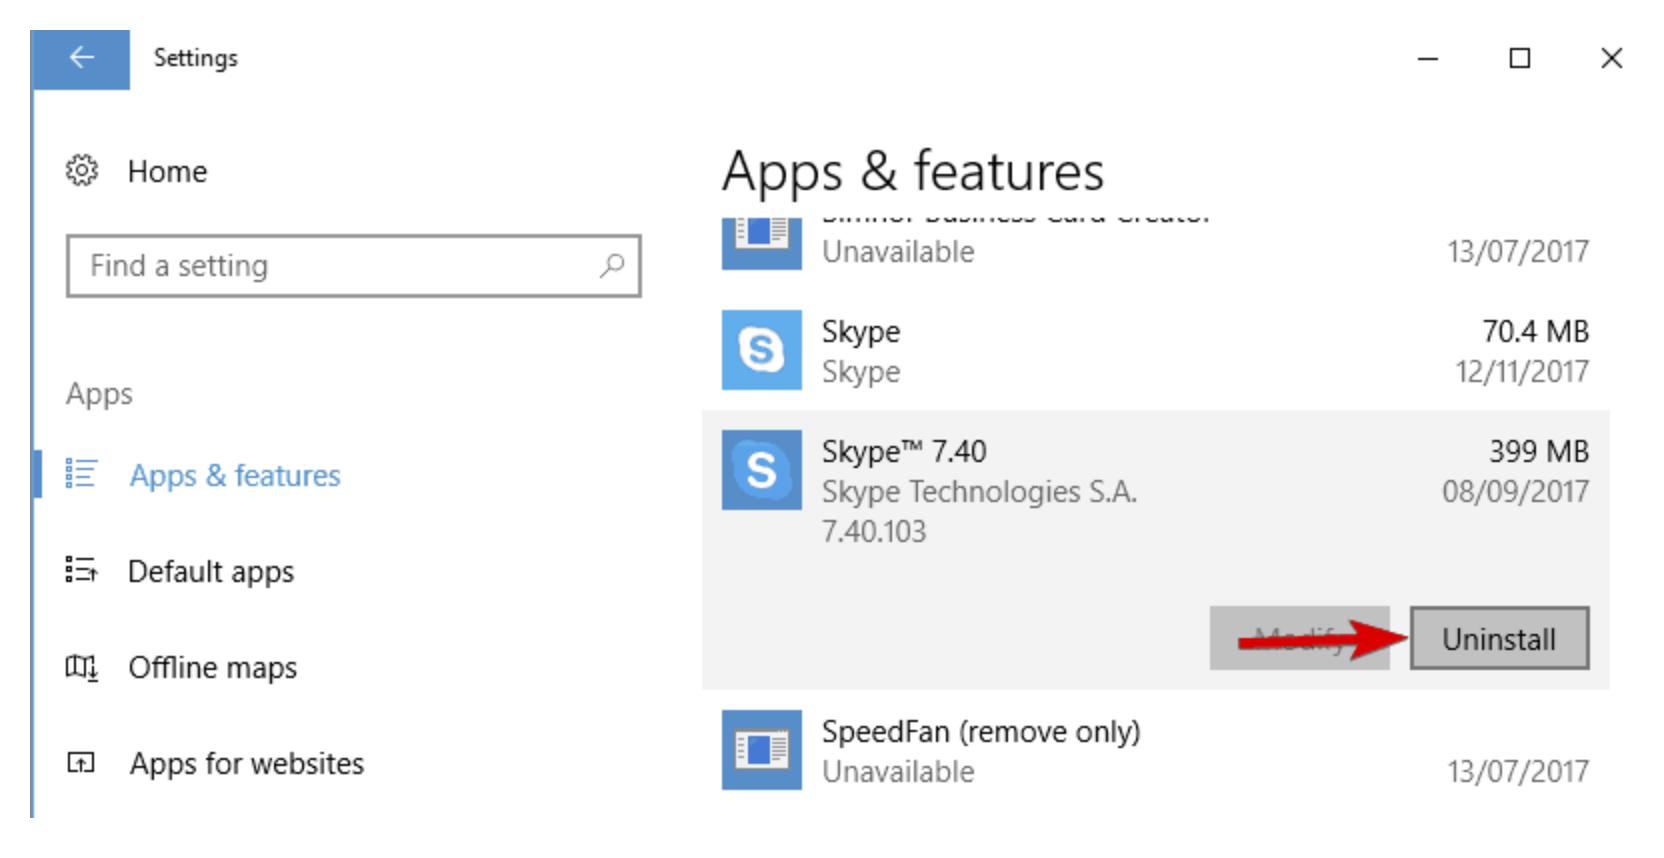 Use the Settings app to uninstall Skype